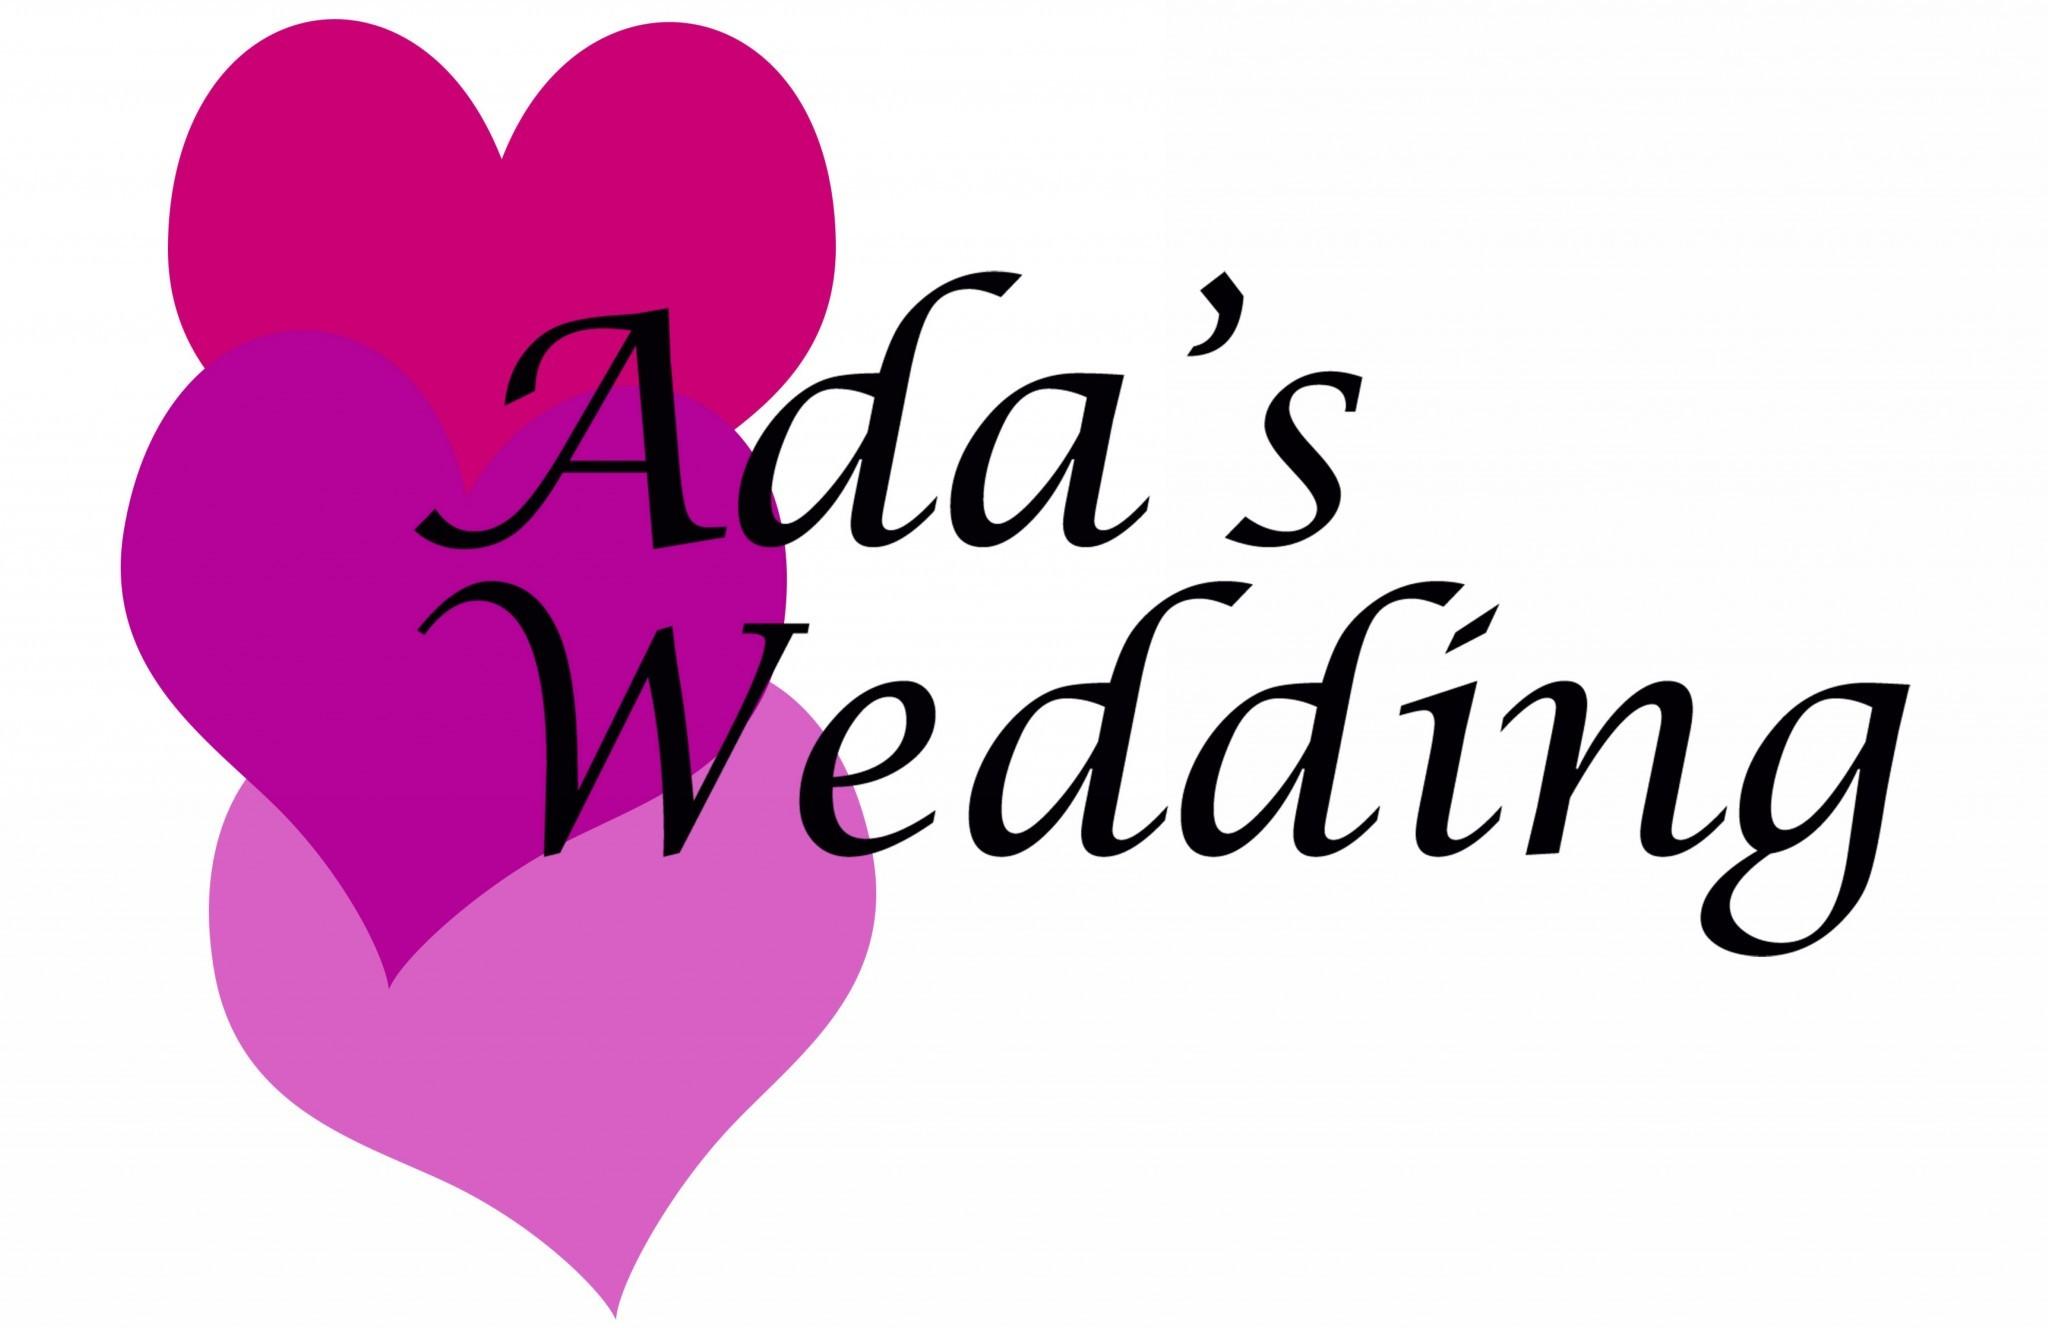 Ada's Wedding I 最具信譽一站式婚禮統籌服務公司I婚展價l婚禮司儀$2280